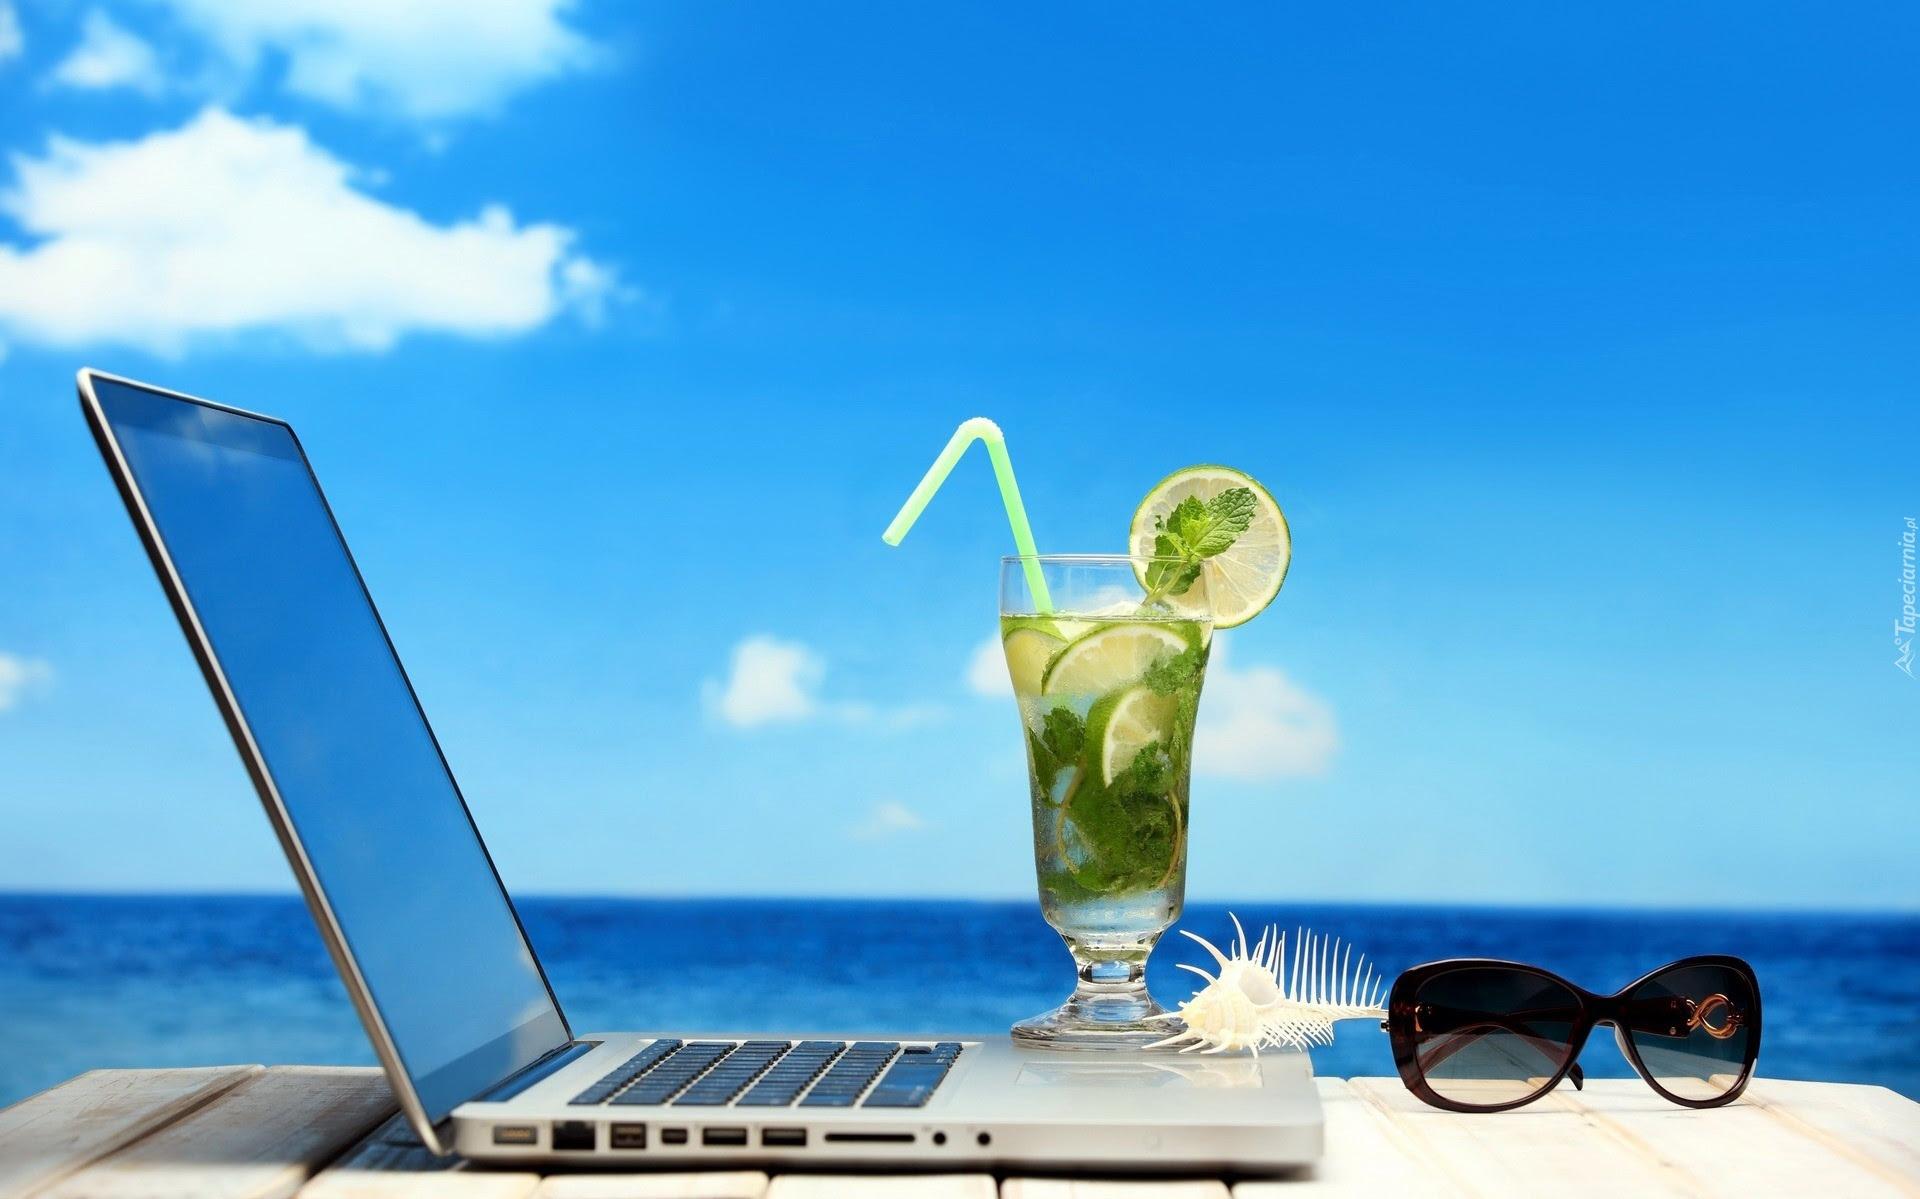 Laptop. Drink, Okulary, Morze, Lato